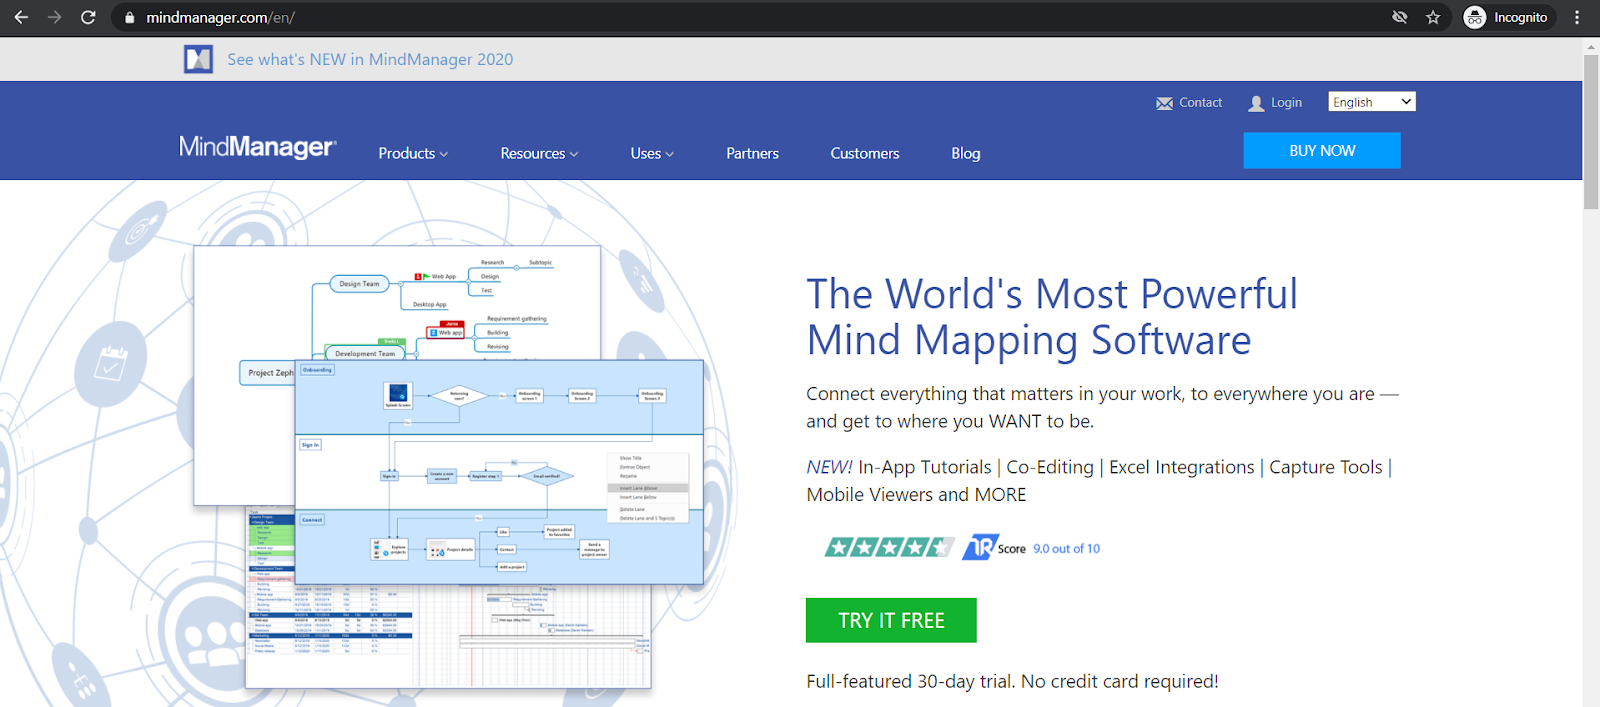 mindjet homepage